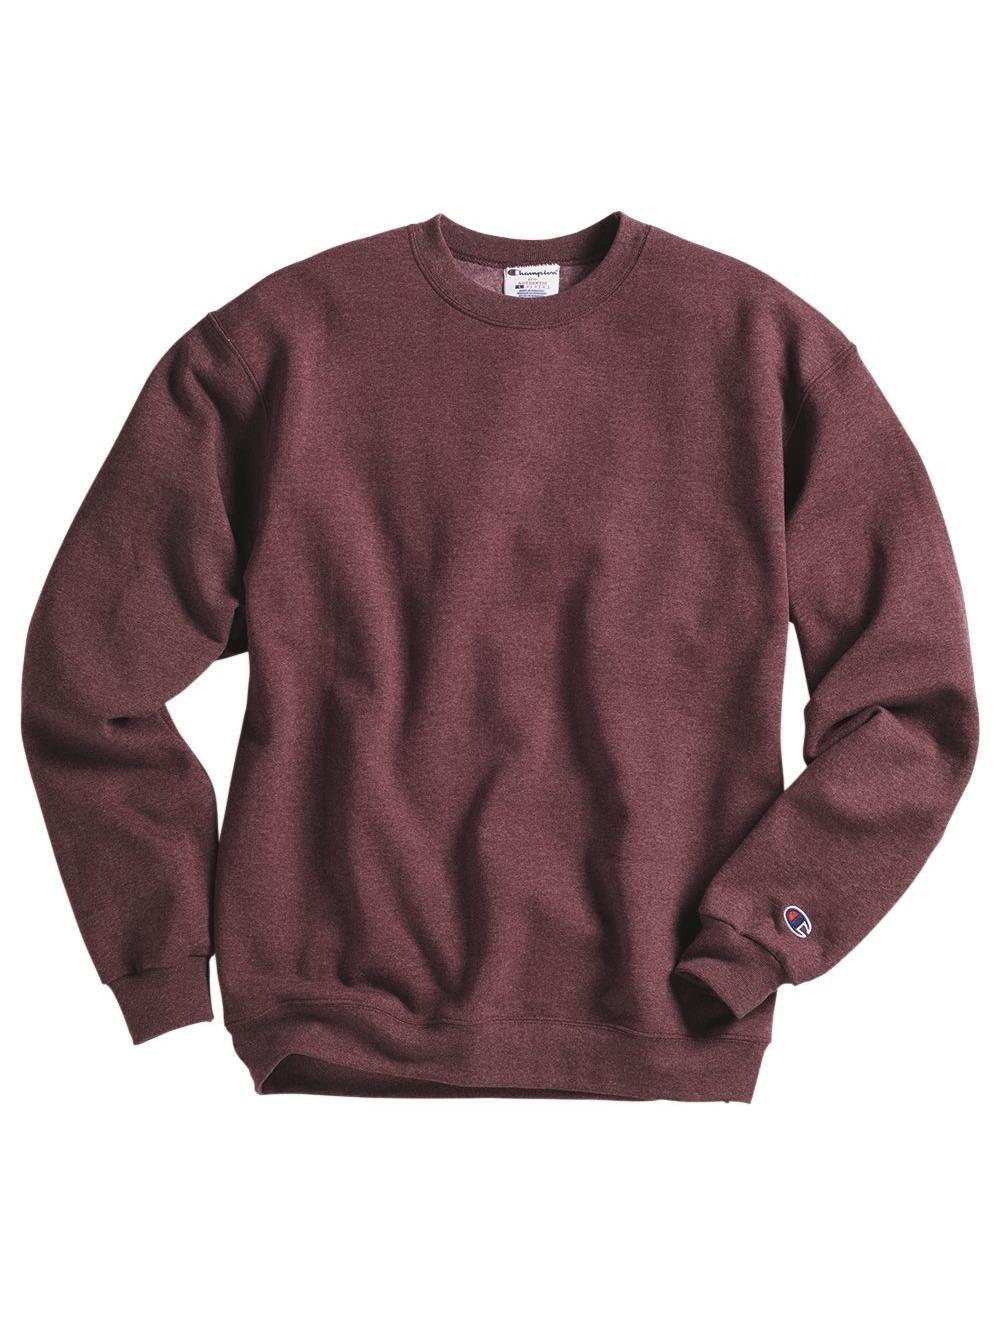 Free Shipping Buy Champion Fleece Double Dry Eco Crewneck Sweatshirt At Walmart Com Crew Neck Sweatshirt Sweatshirts Mens Crewneck Sweatshirt [ 1333 x 1000 Pixel ]